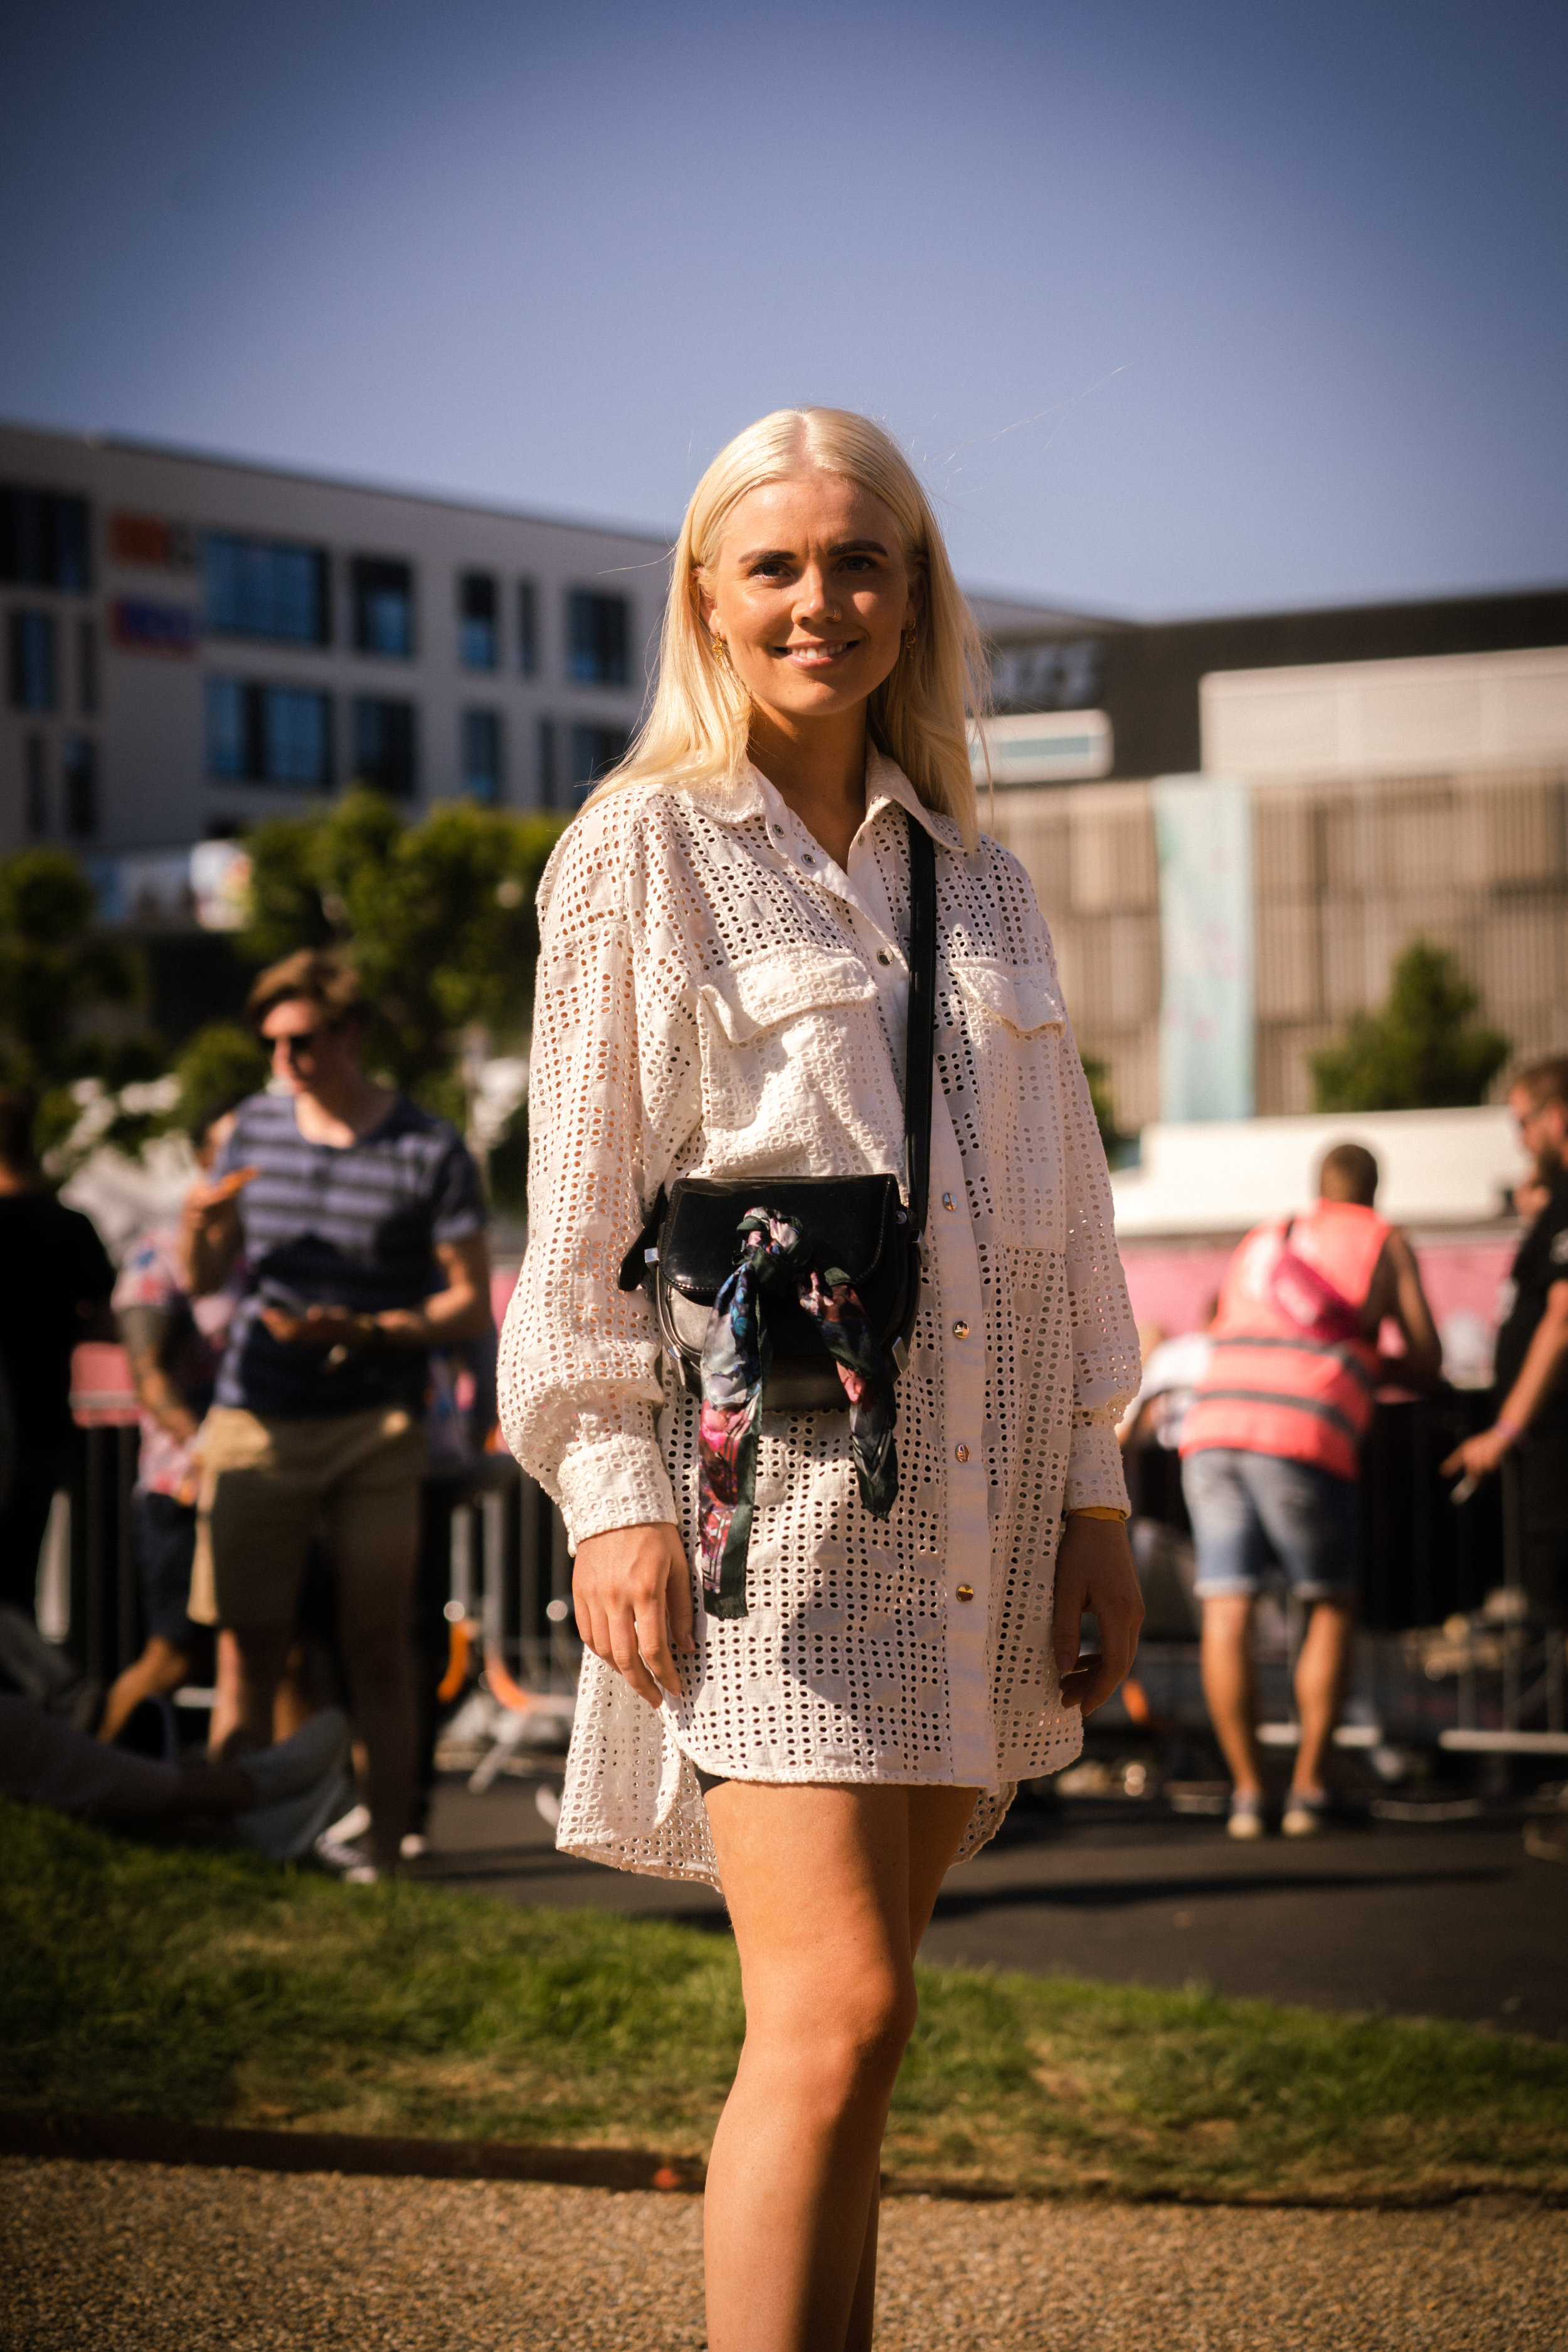 Celine Aaneland    looking beautiful in this white summer dress from Zara, a must in every wardrobe! Photo: Sander Berhus / Estér Magazine.